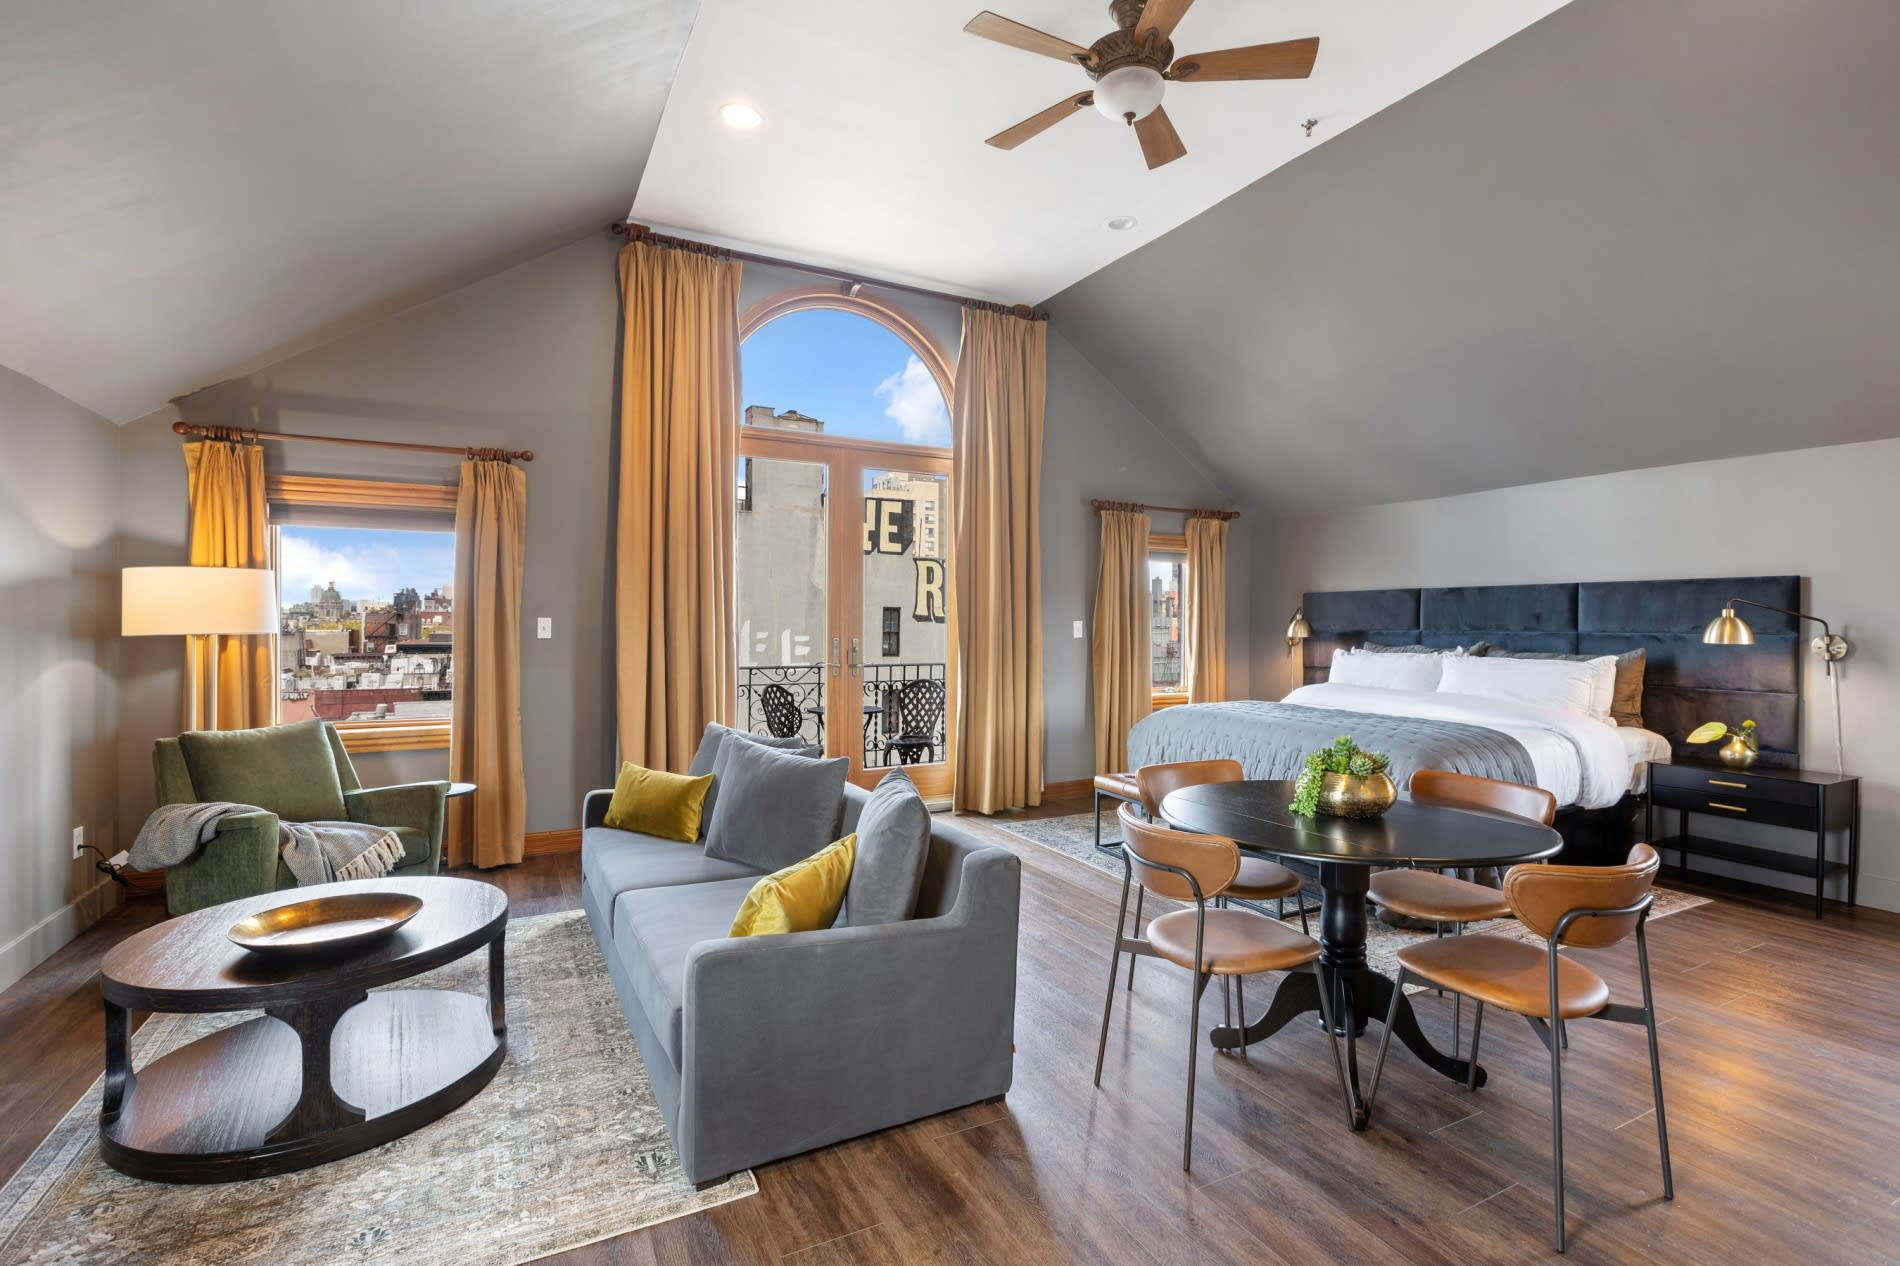 Hospitality-tech company Jurny powers landmark lower east side hotel's revitalization